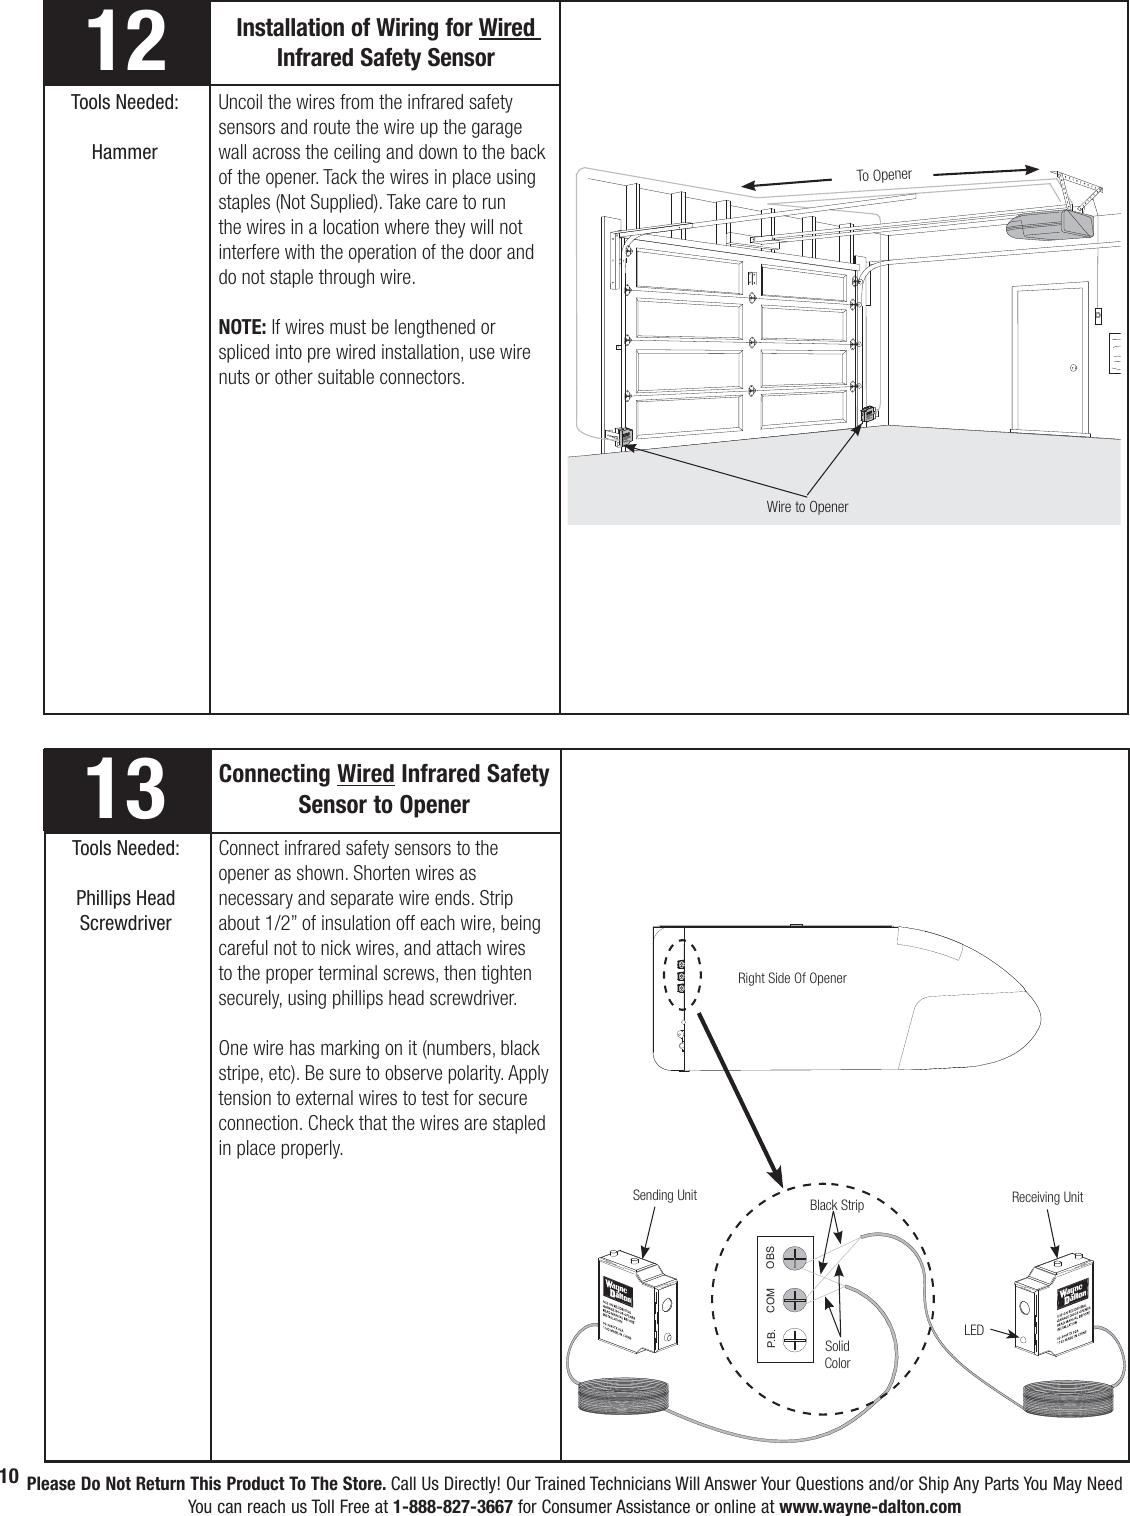 [DIAGRAM_38EU]  Wayne Dalton Wiring Diagram | Wiring Diagram | Liftmaster Model Ats2113x Wiring Diagram |  | Wiring Diagram - Autoscout24